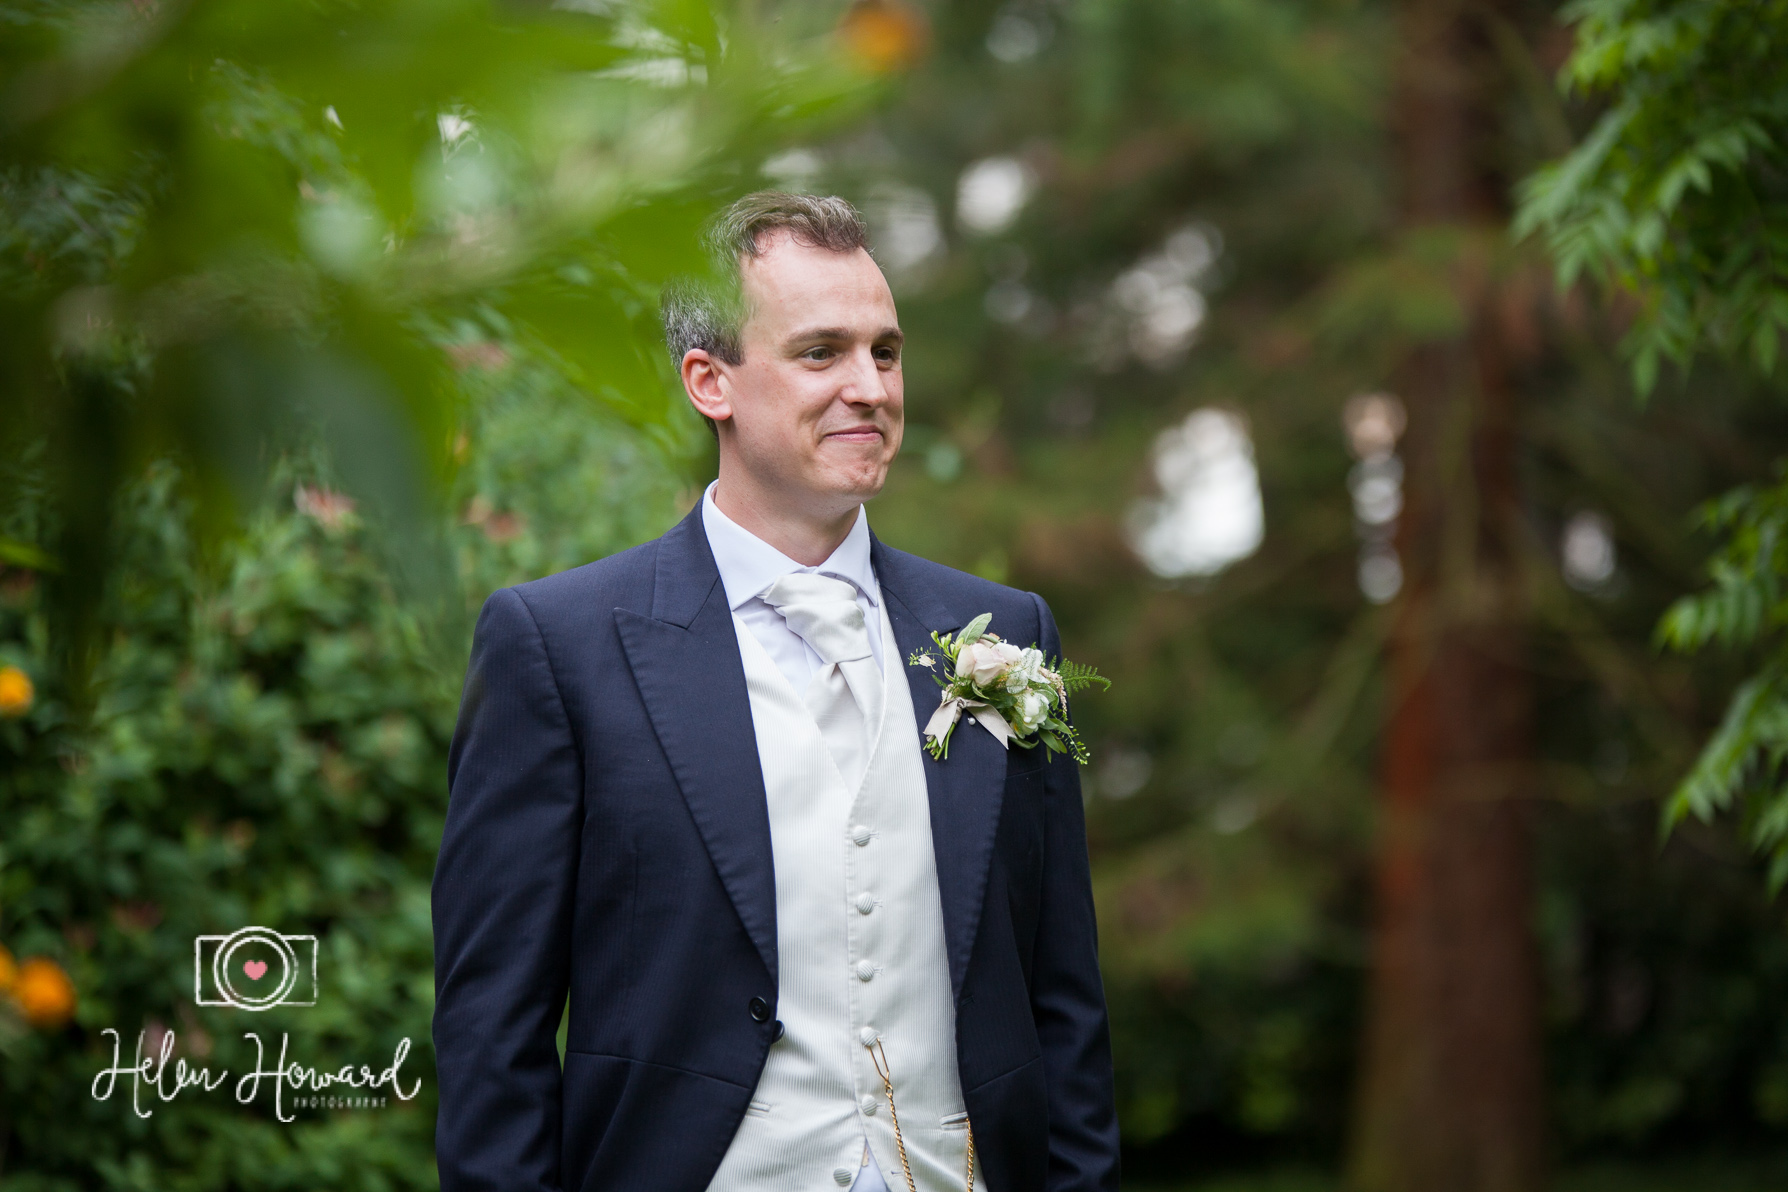 Helen Howard Photography Packington Moor Wedding-110.jpg